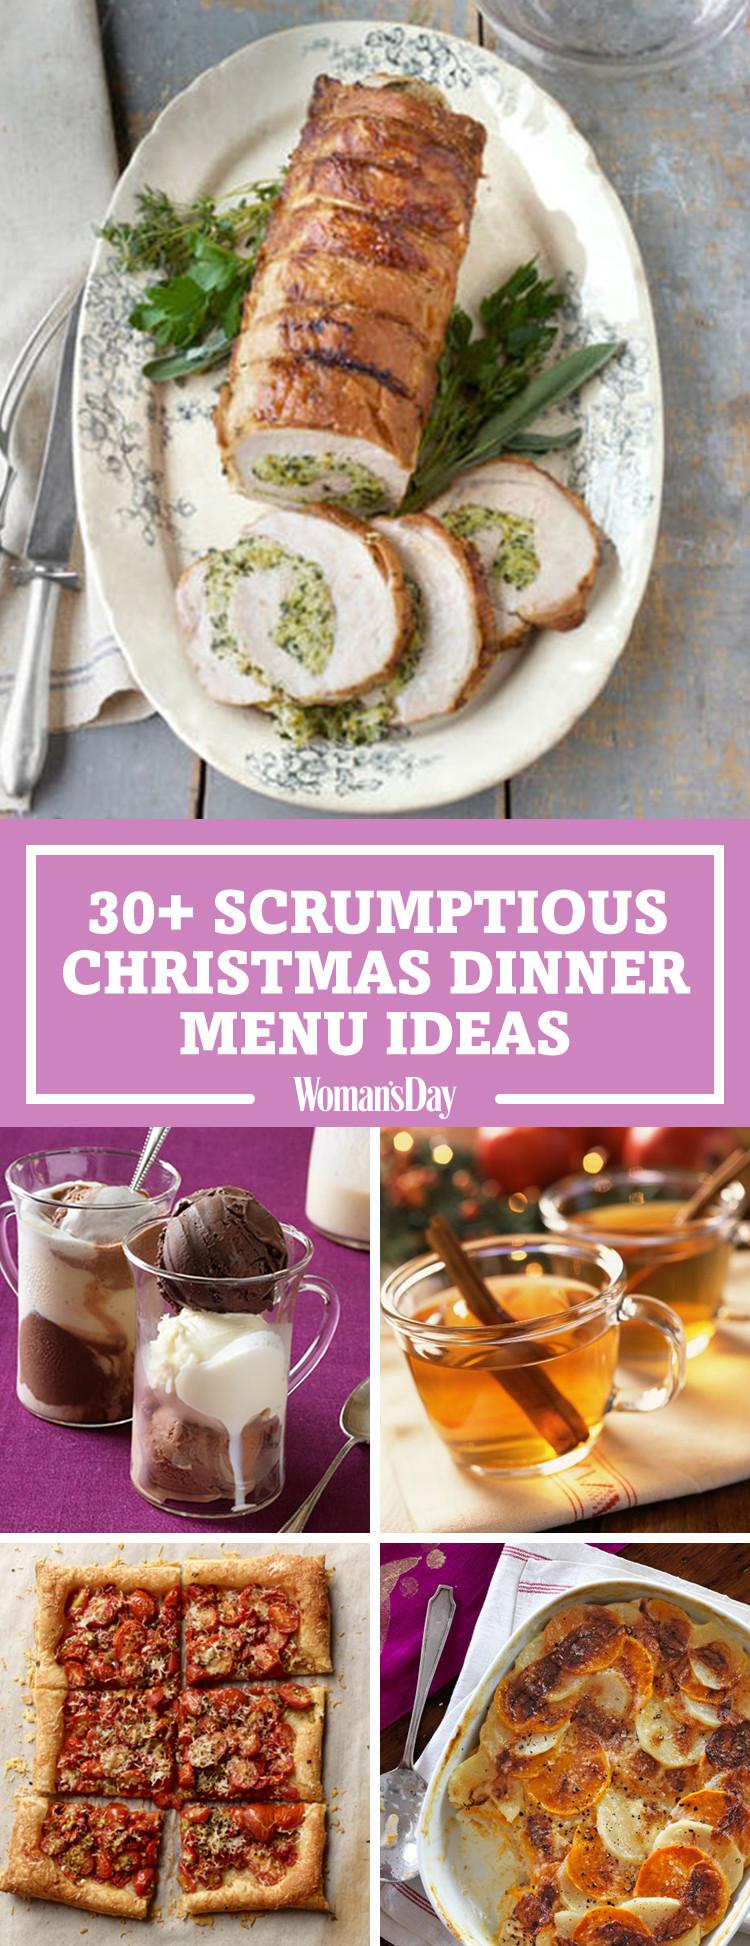 Christmas Recipes Dinner  Best Christmas Dinner Menu Ideas for 2017